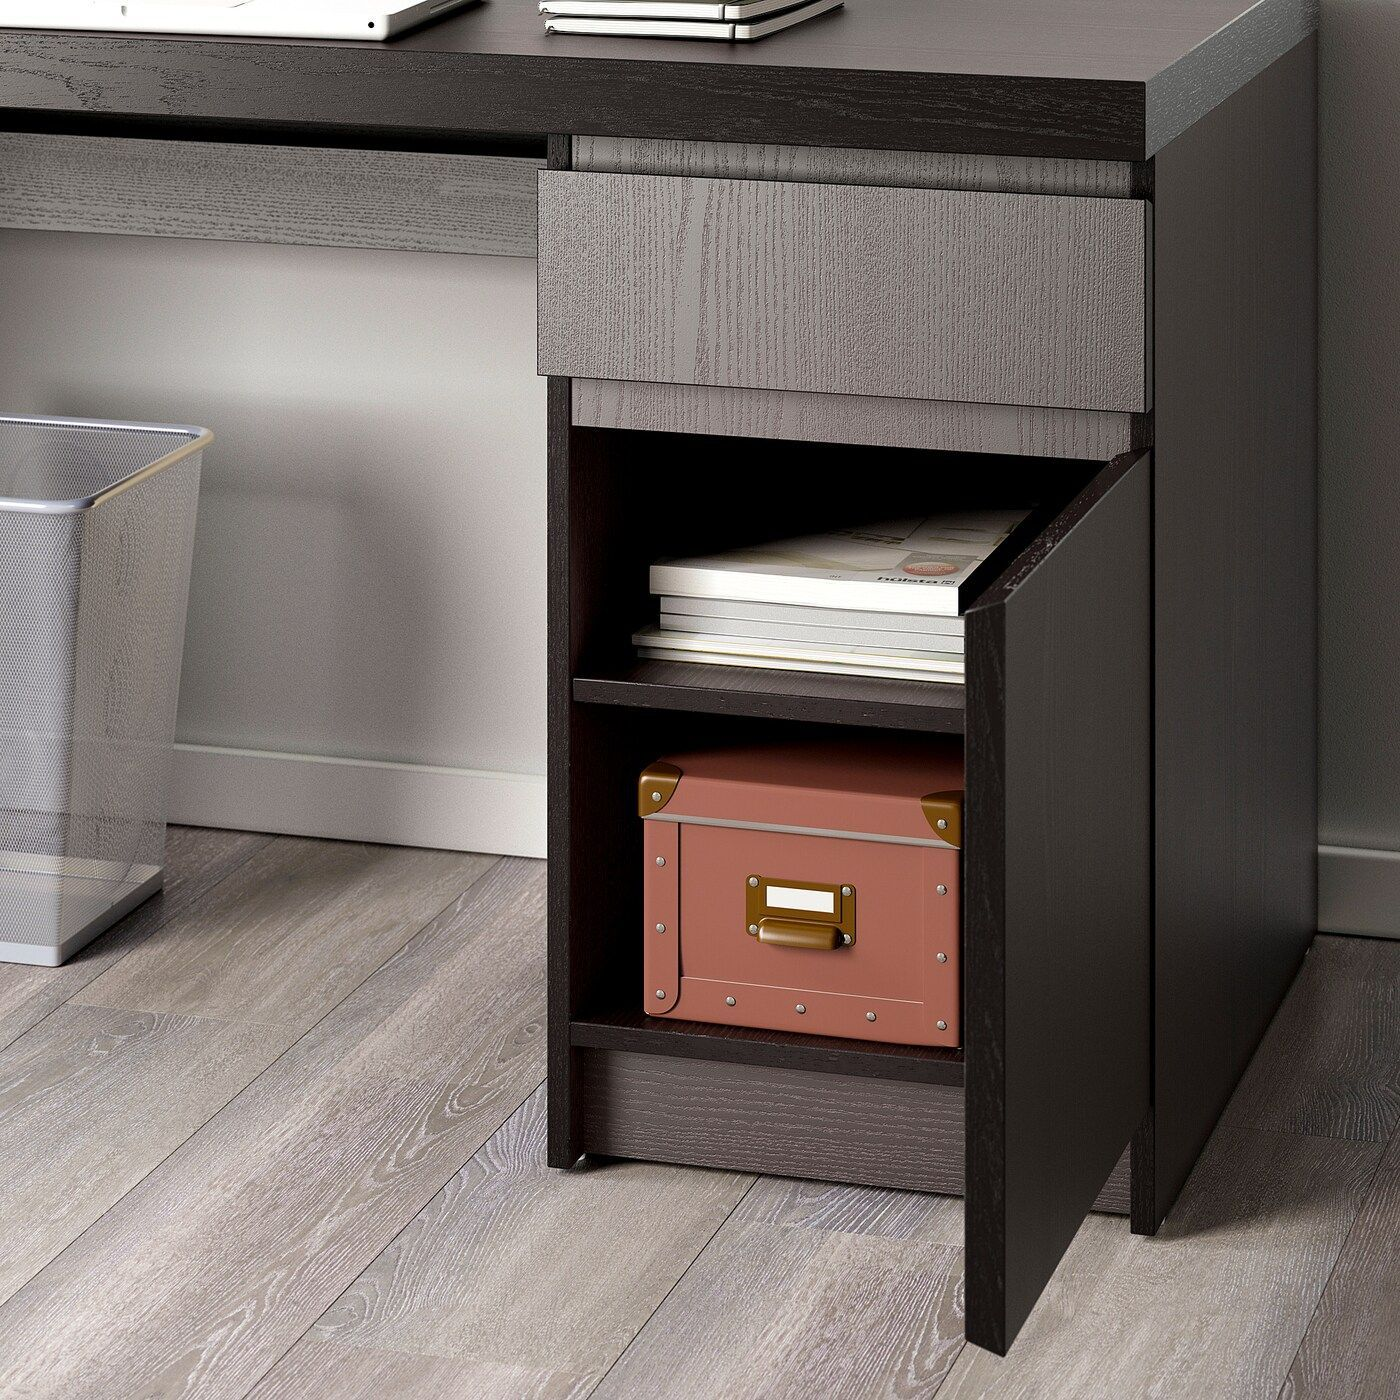 Ikea Malm Schreibtisch Holz